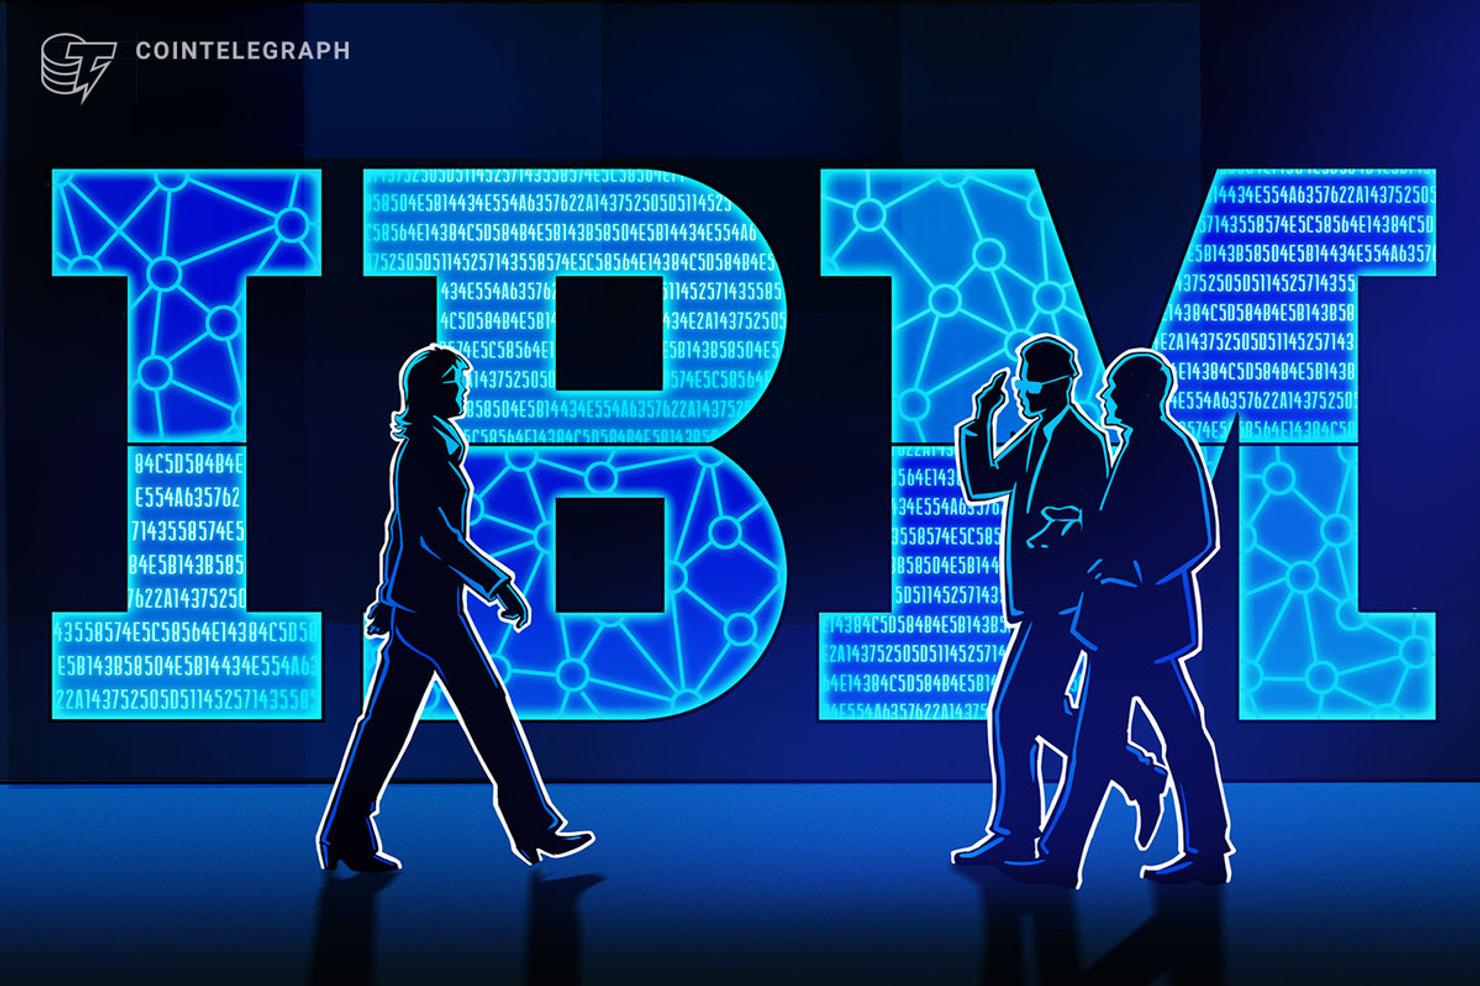 IBM,ホタテ用にブロックチェーン基盤のサプライチェーンを構築【ニュース】